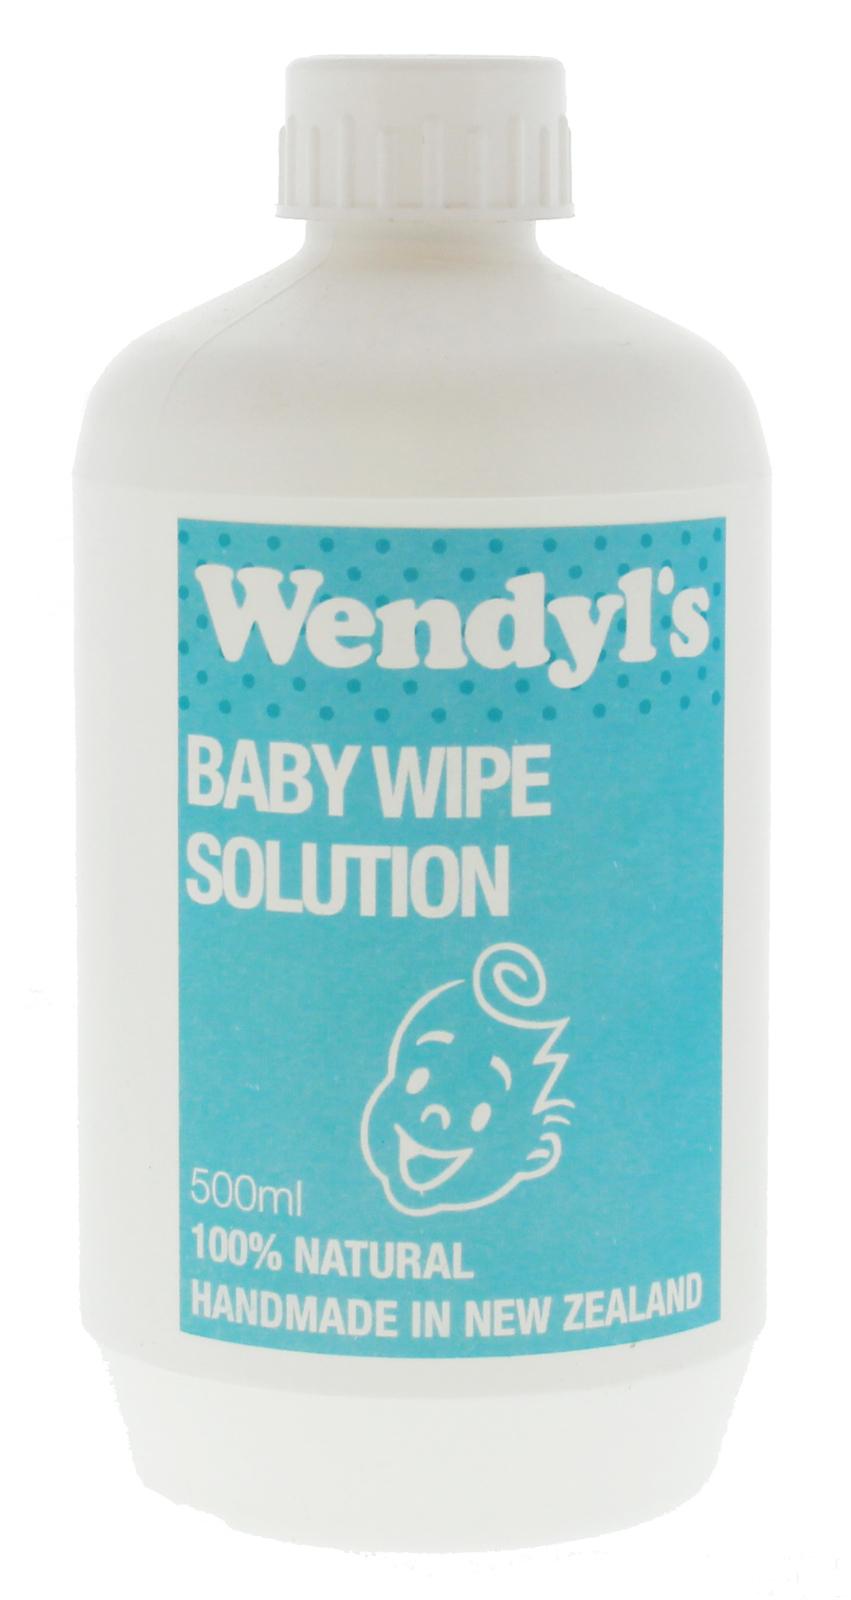 Baby Wipe Solution 500ml - Wendyl's Green Goddess image